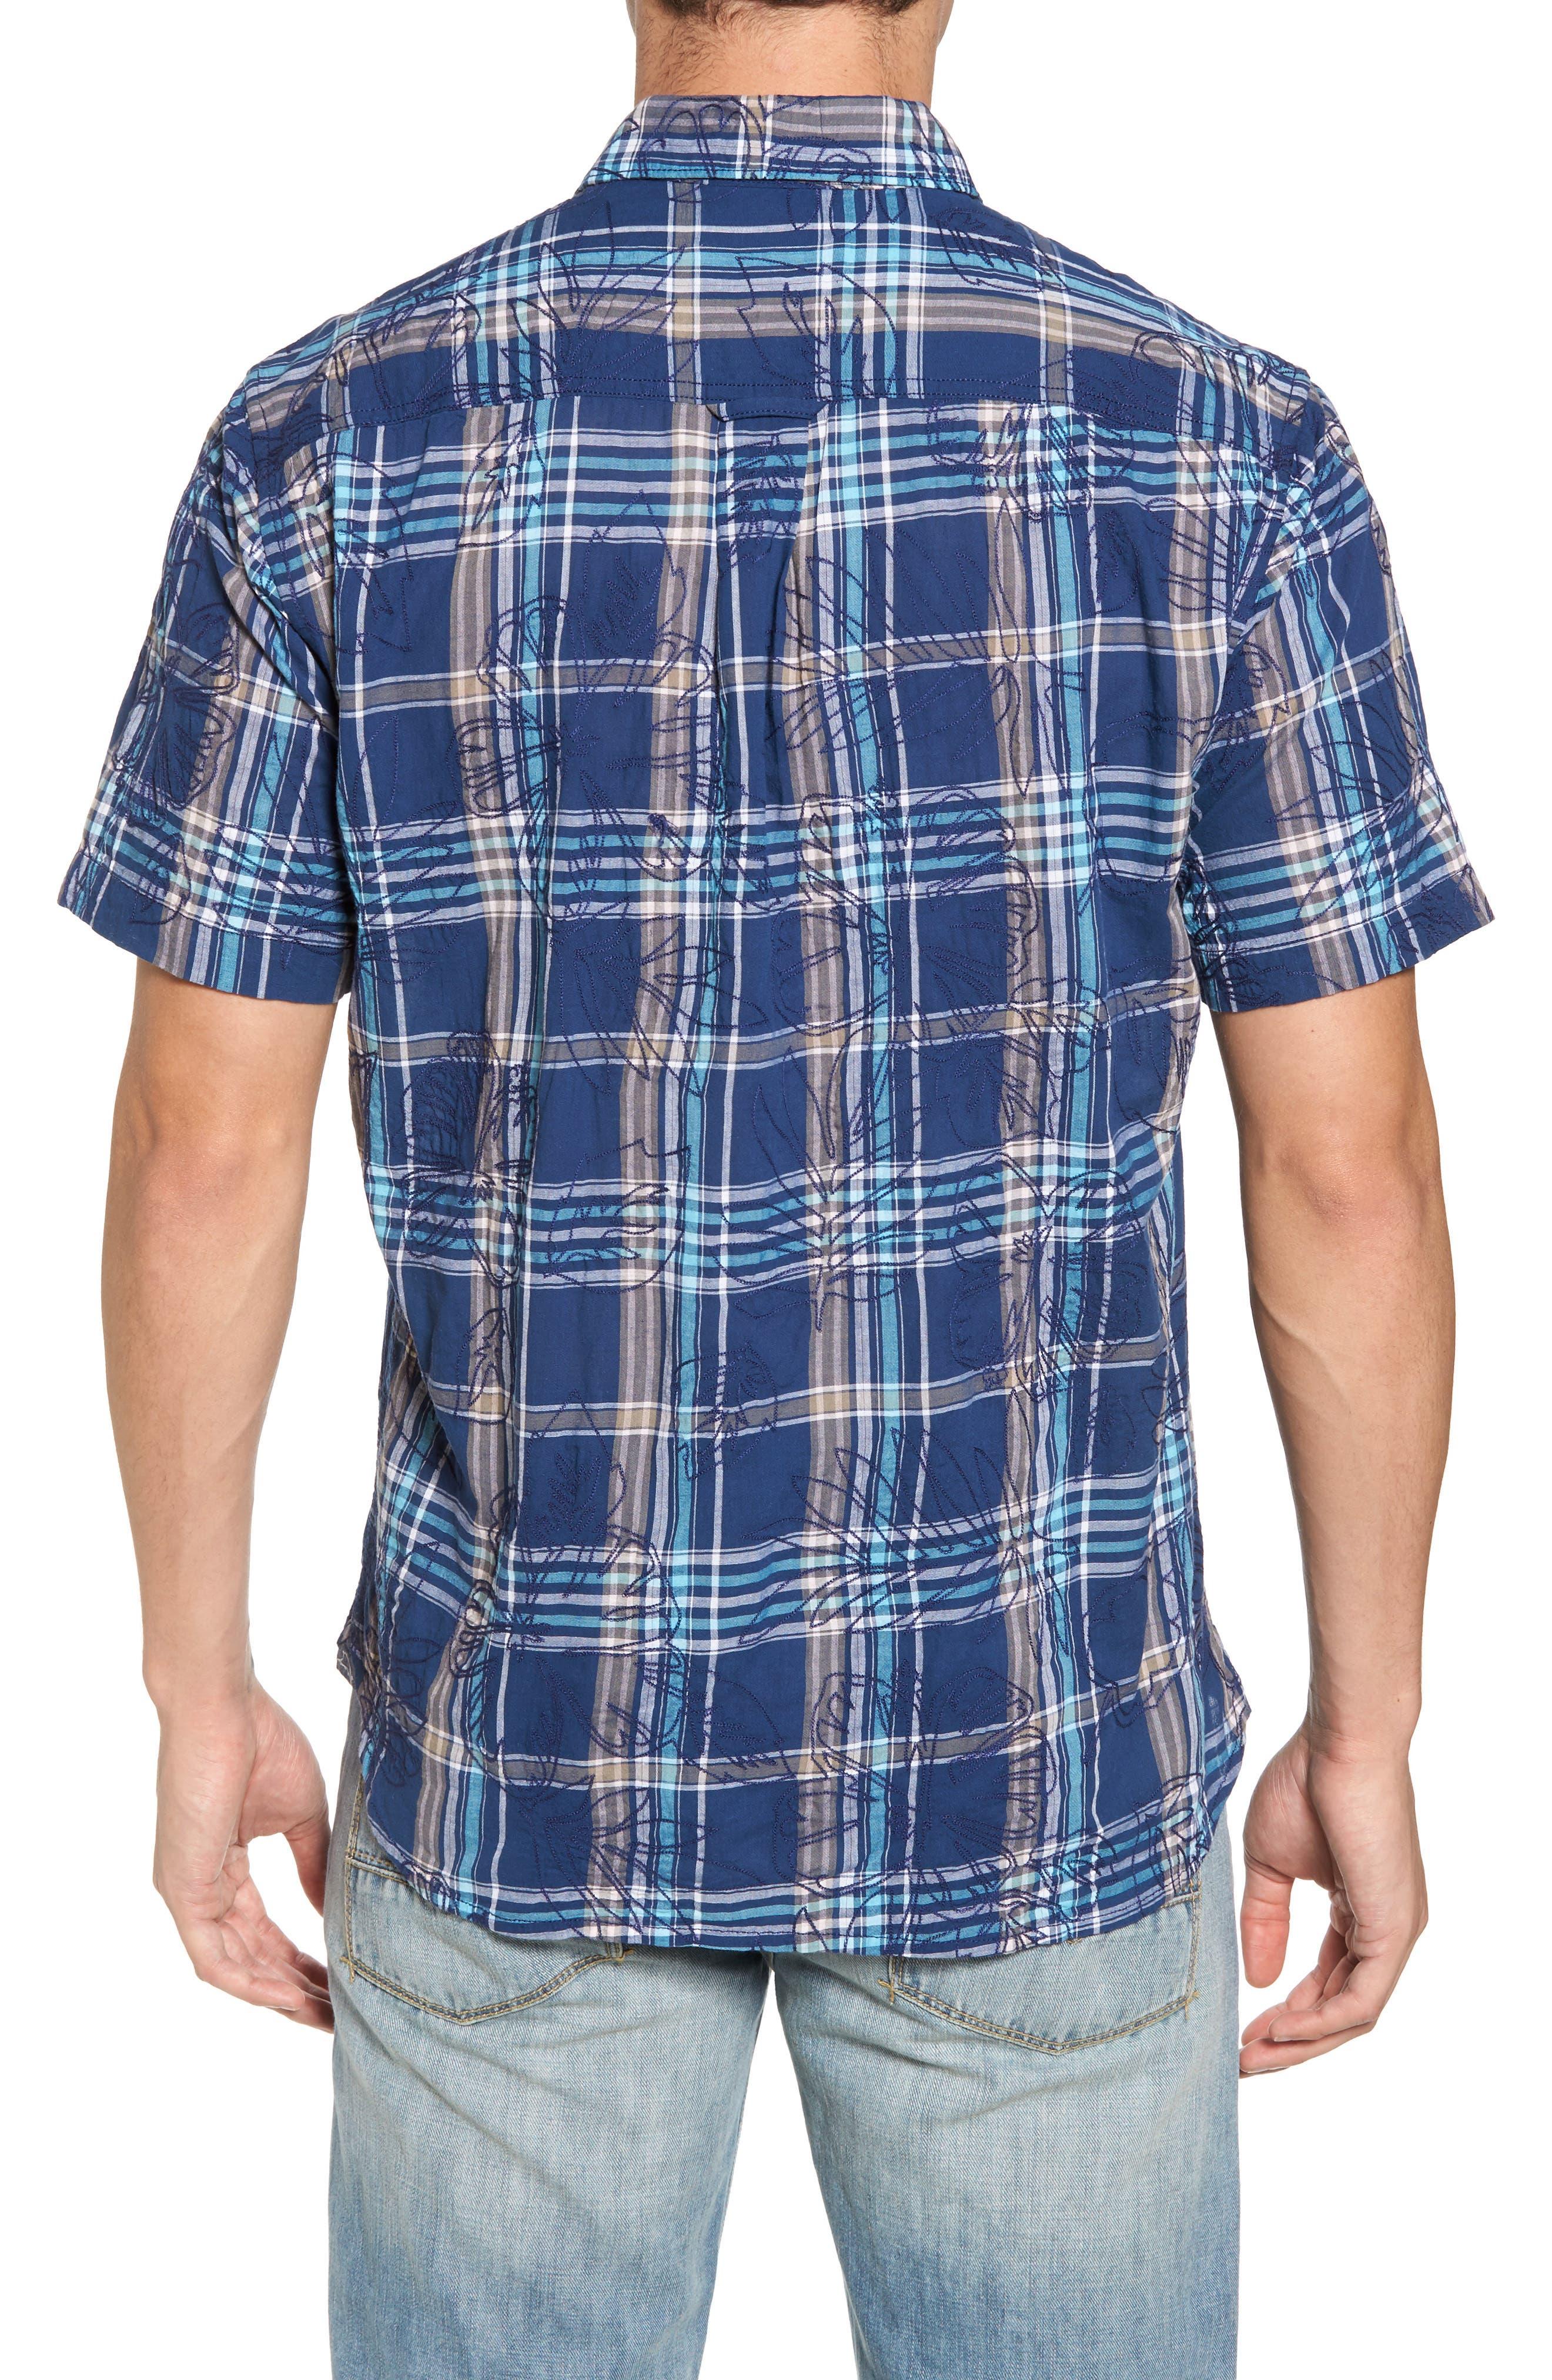 Pallazo Plaid Sport Shirt,                             Alternate thumbnail 2, color,                             Dockside Blue